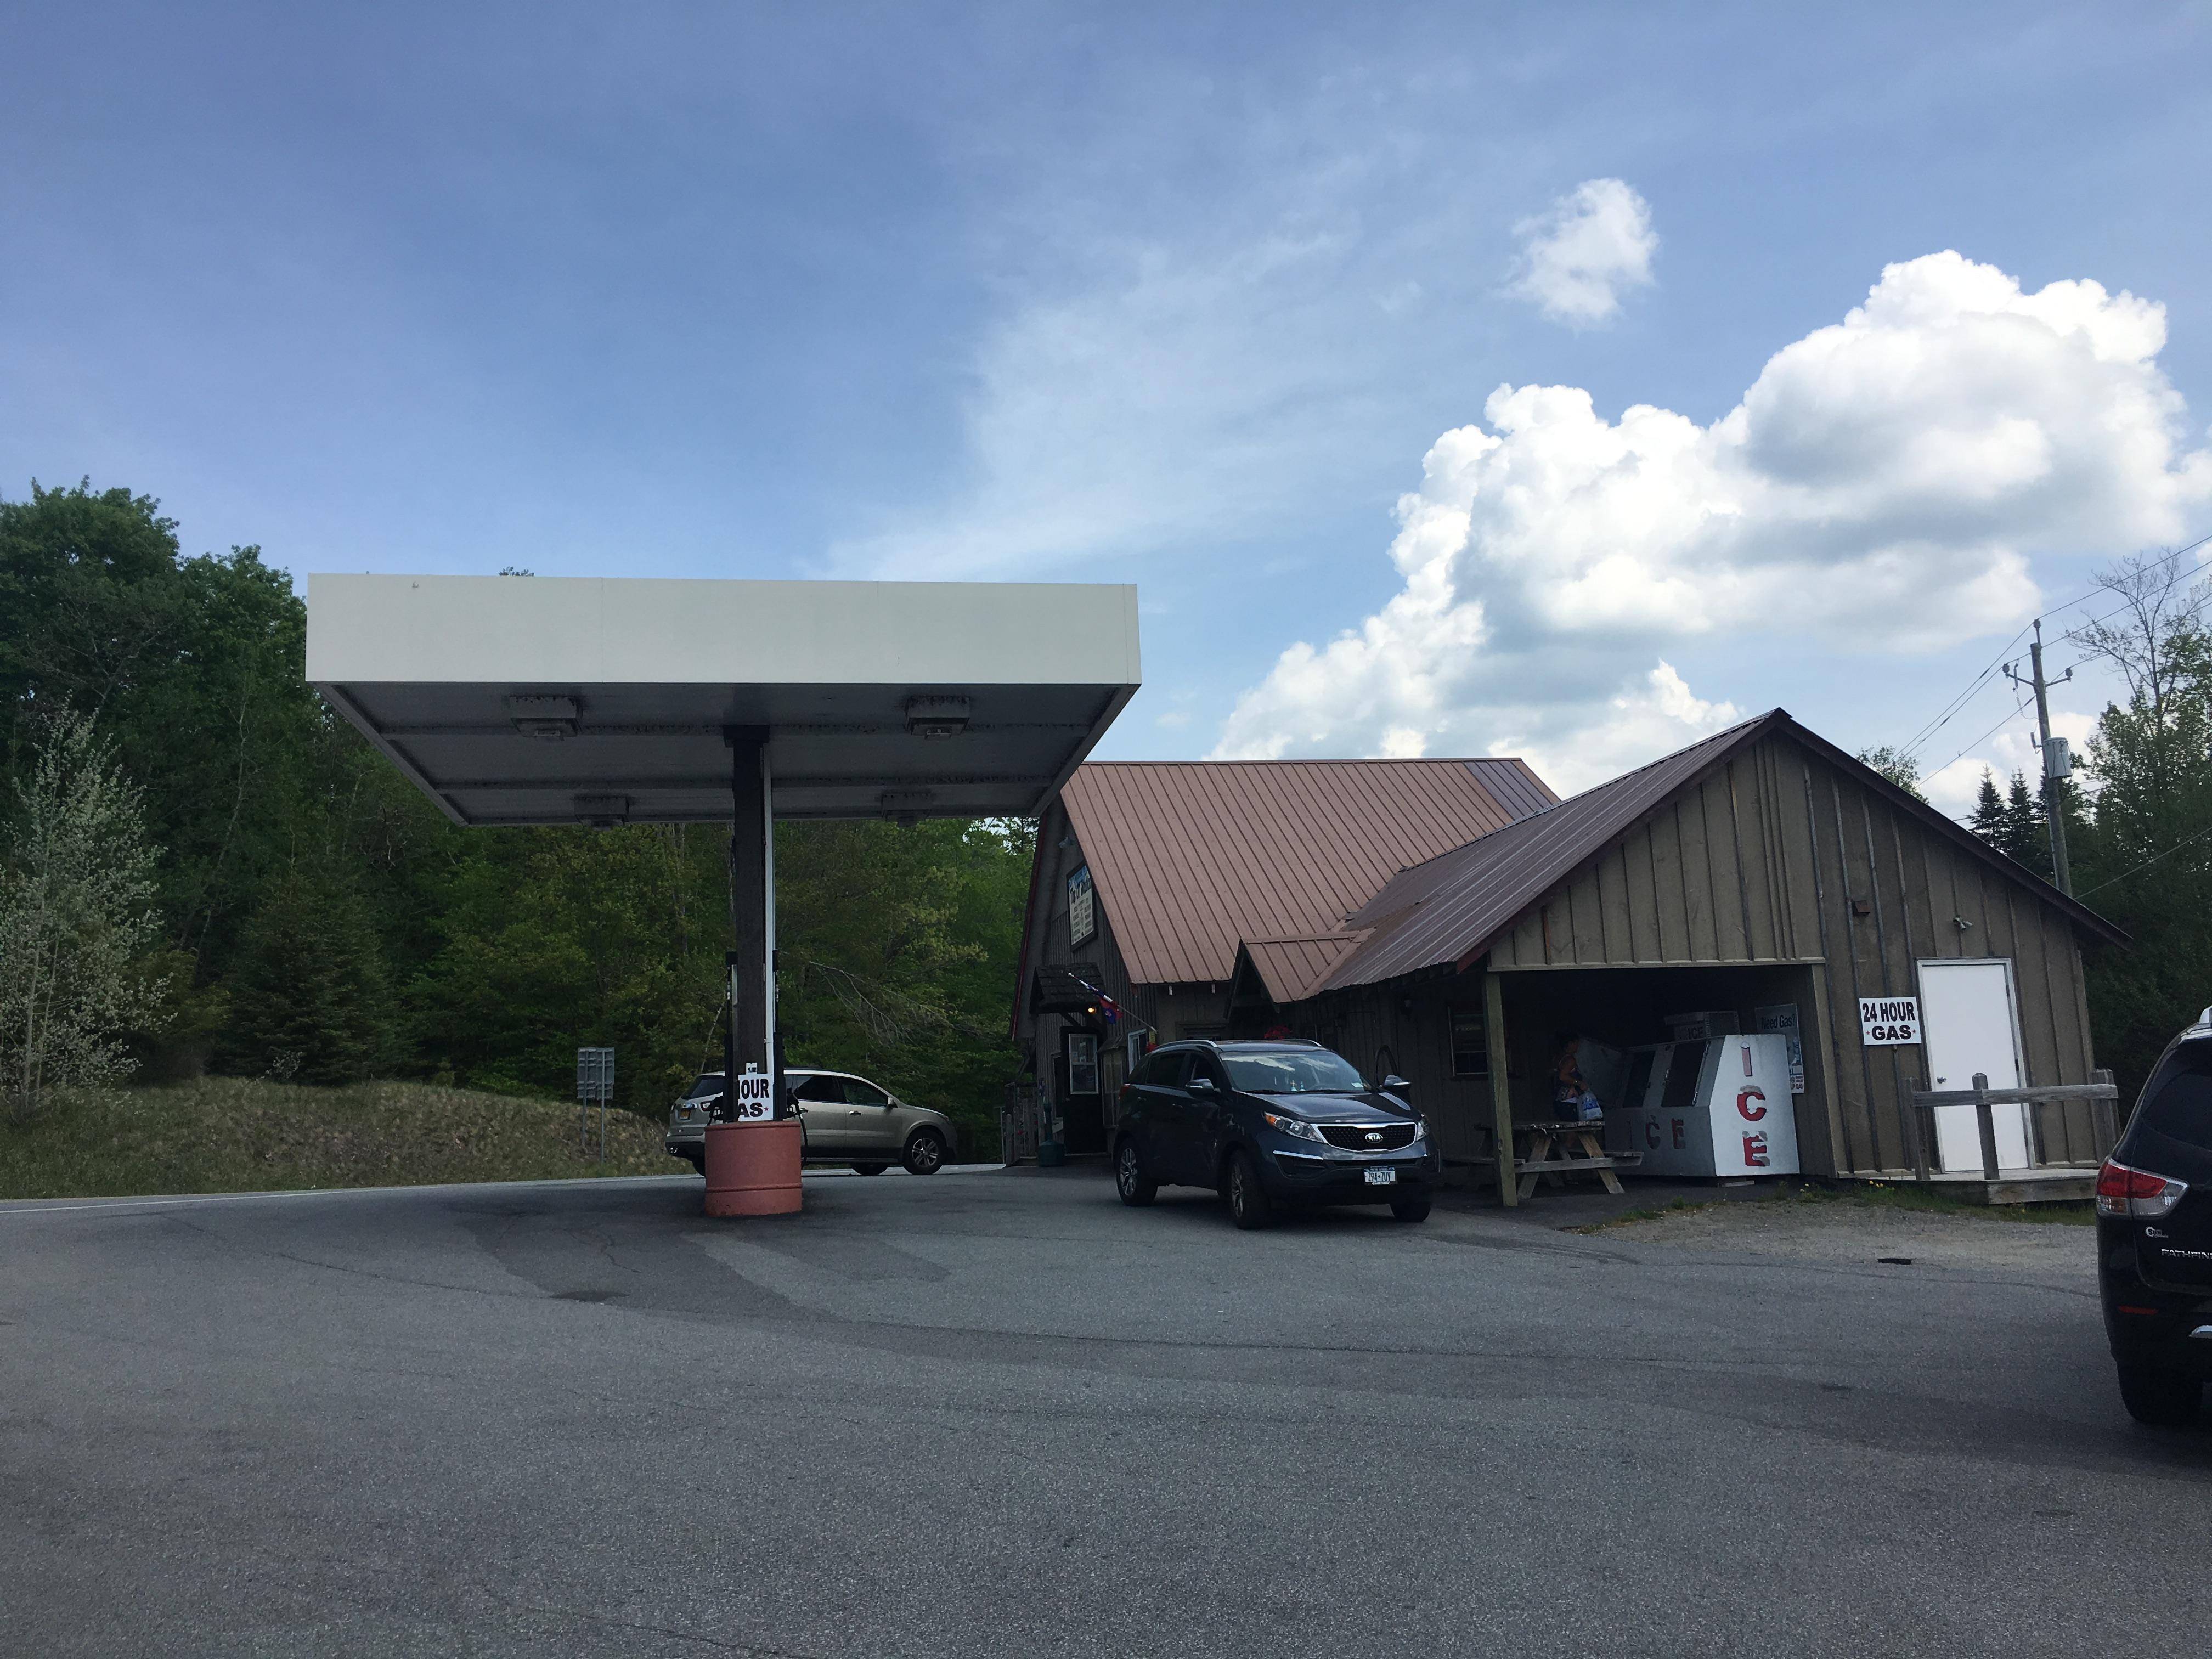 The Ol' Station